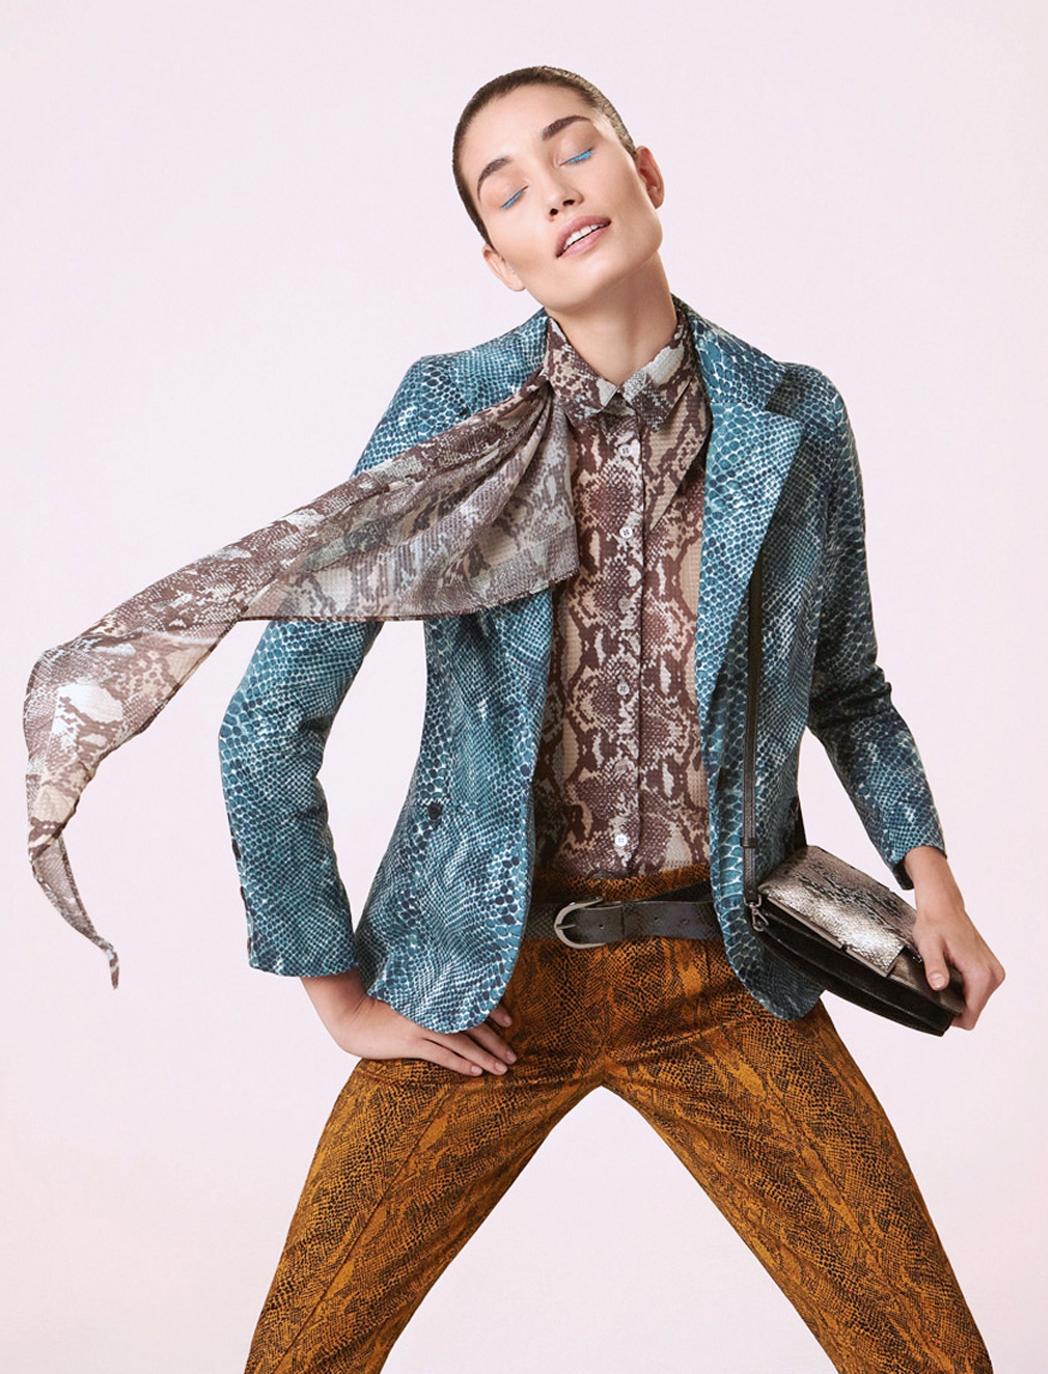 Vogue Brasil Catherine Ferraz